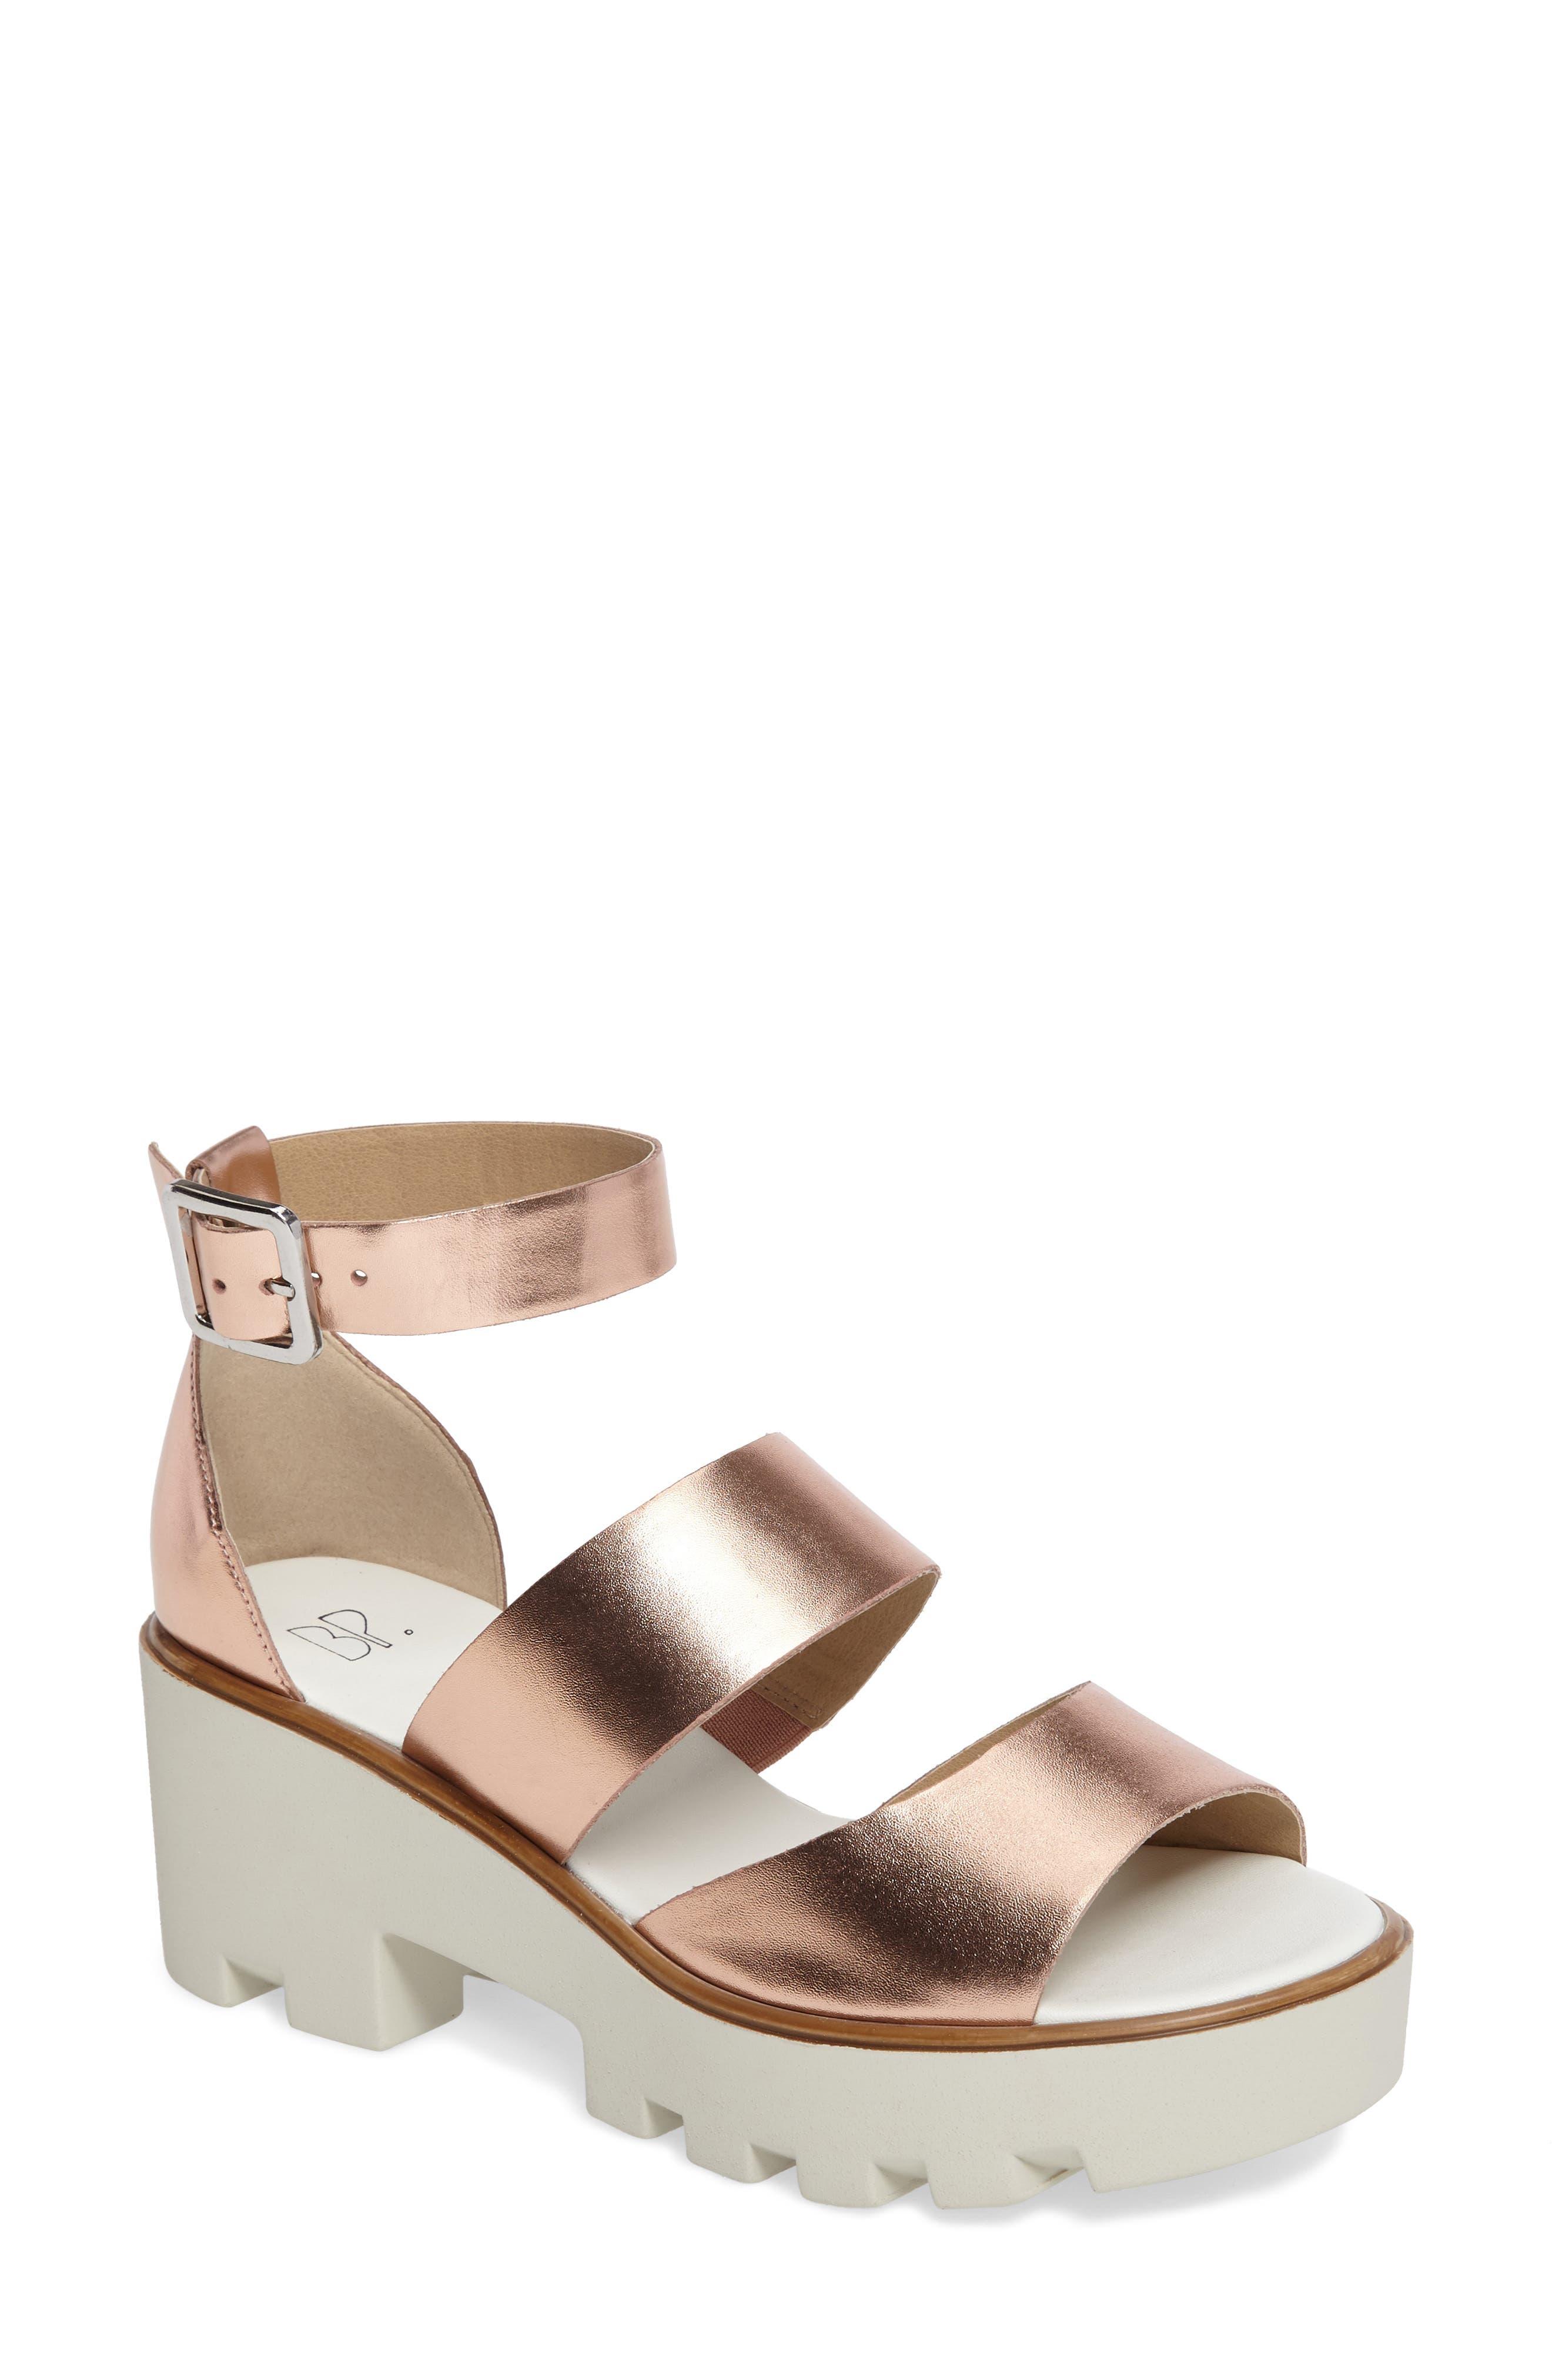 Rowan Platform Sandal,                         Main,                         color, Rose Gold Leather